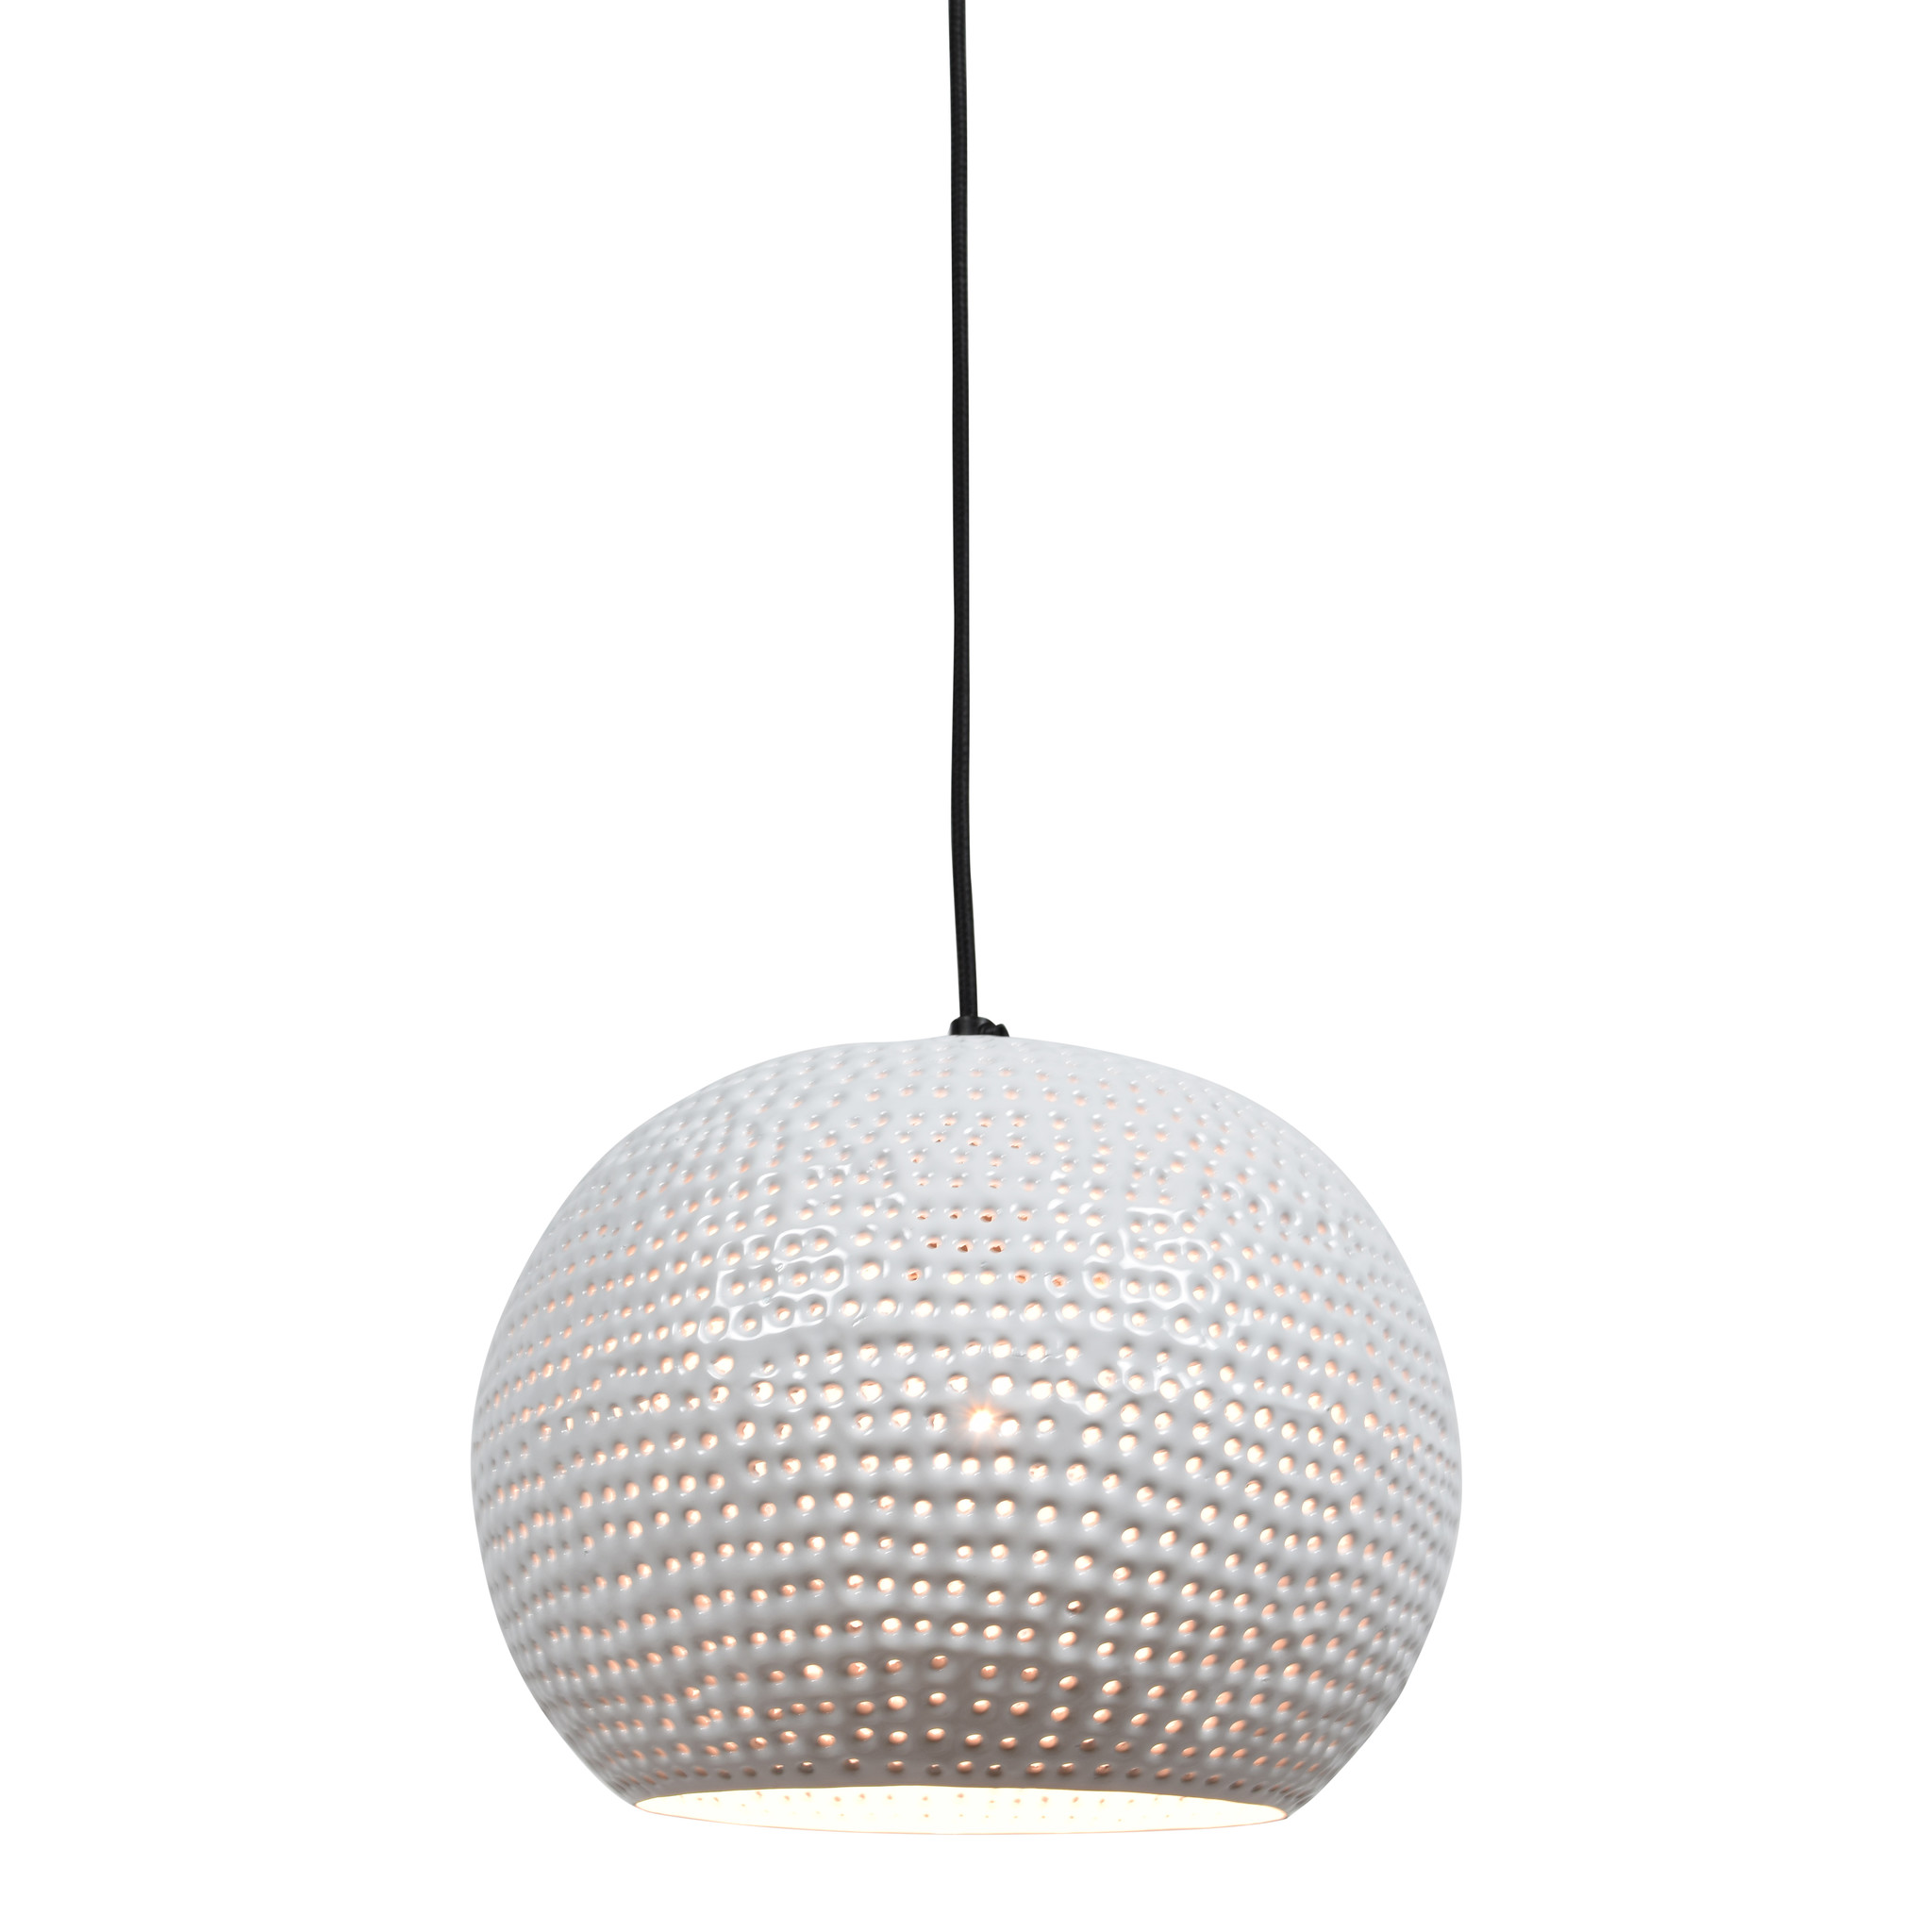 Urban Interiors Urban Interiors Hanglamp Spike bol ø27cm glossy white-AI-PL-002B-W-8718868314659